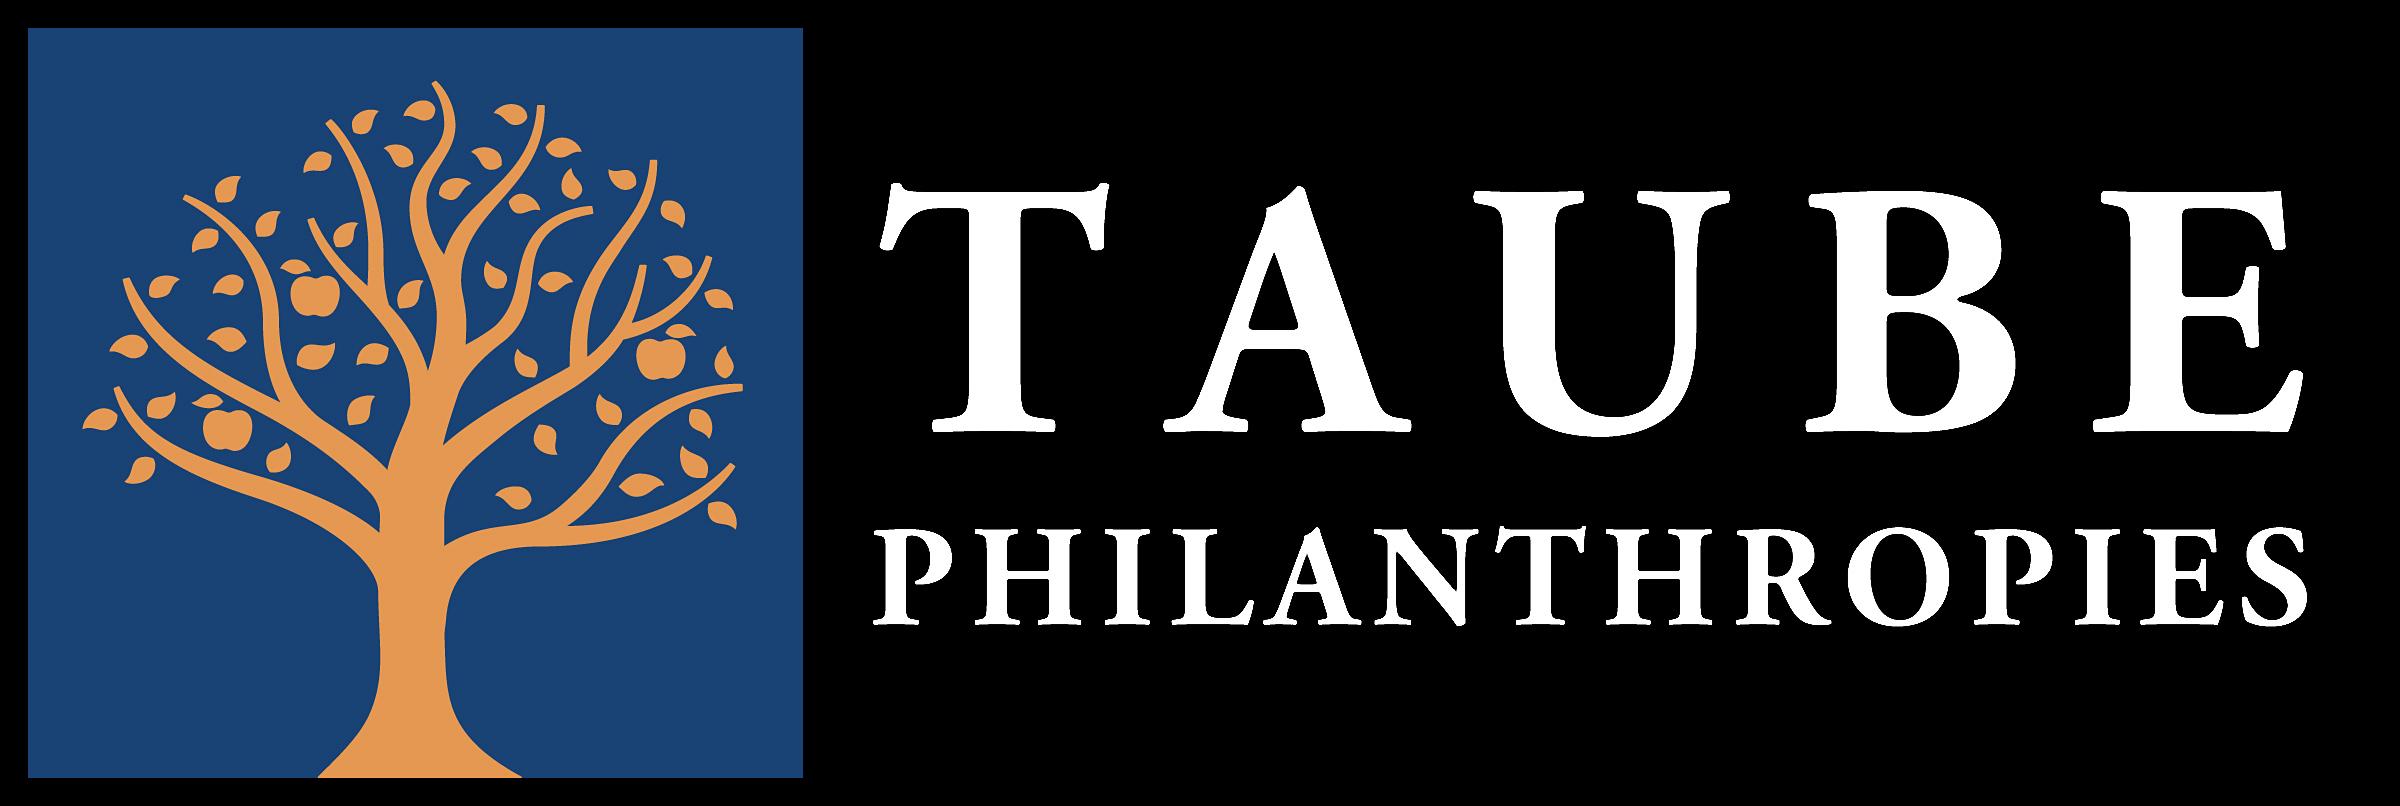 TaubePhil_logo-hztl-lrg.jpg